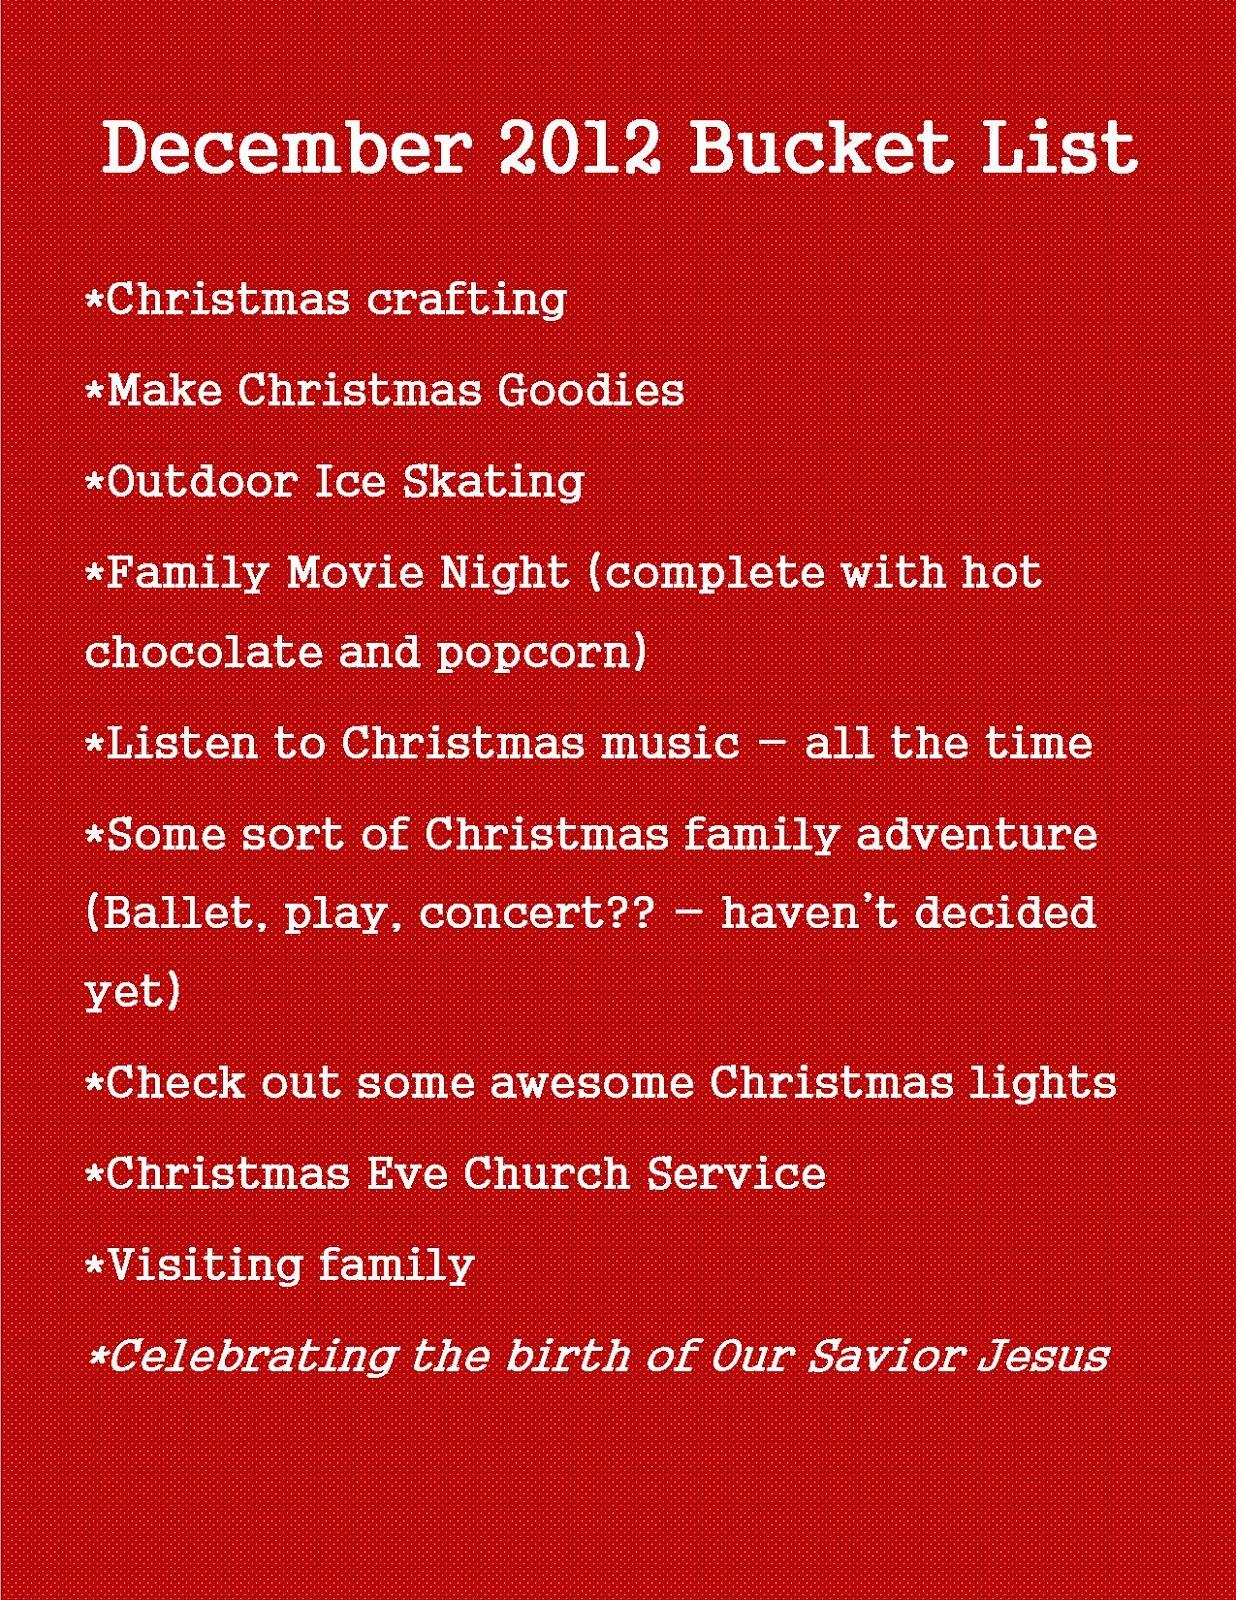 December 2012 Bucket List frazzled JOY